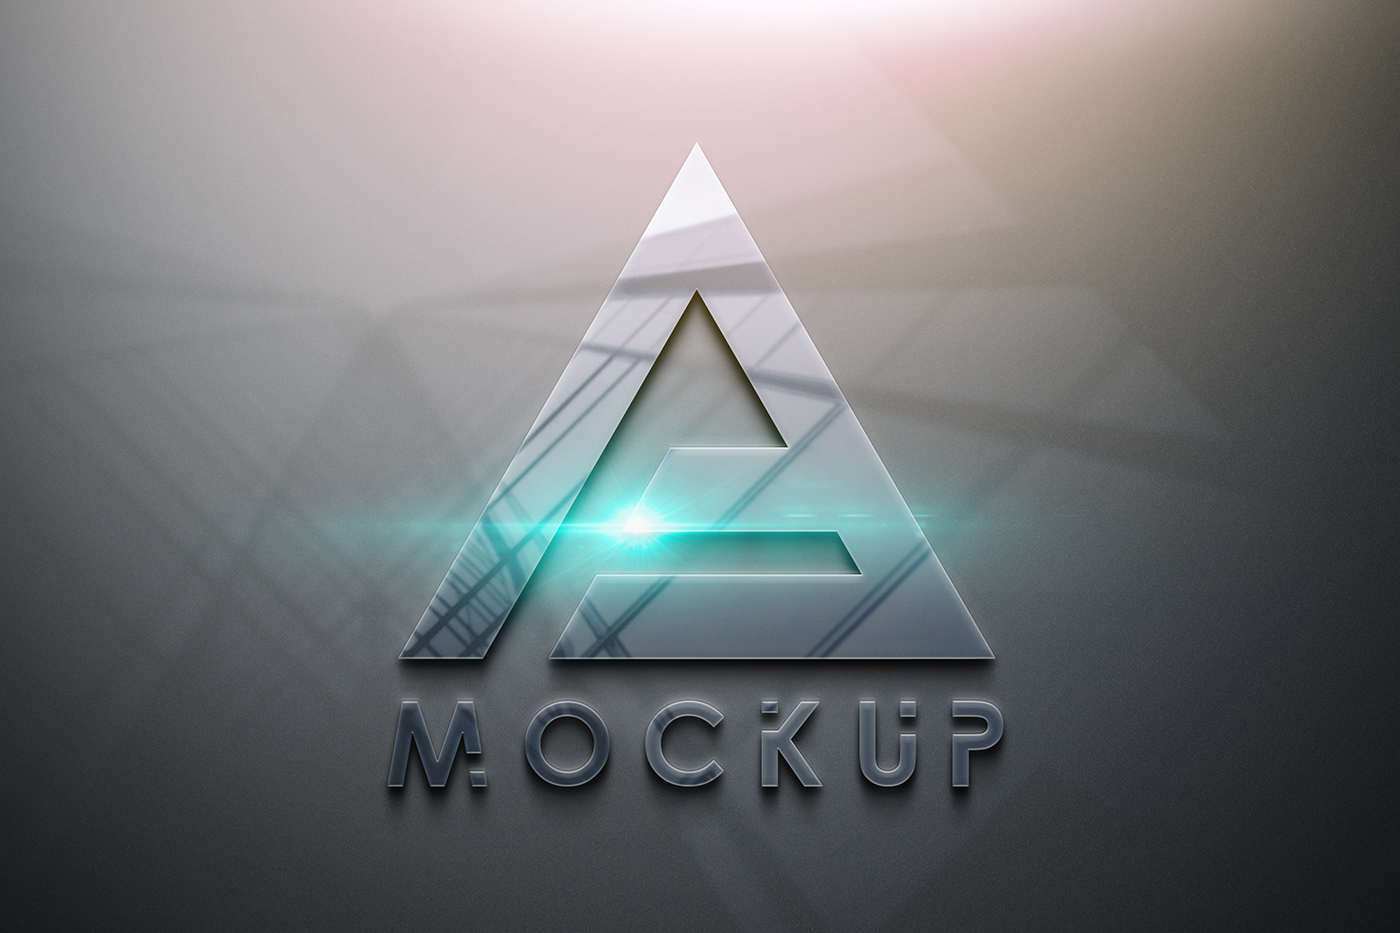 editable free free mockup  freebie graphic resources Logo Design logo Mockup Mockup modern psd